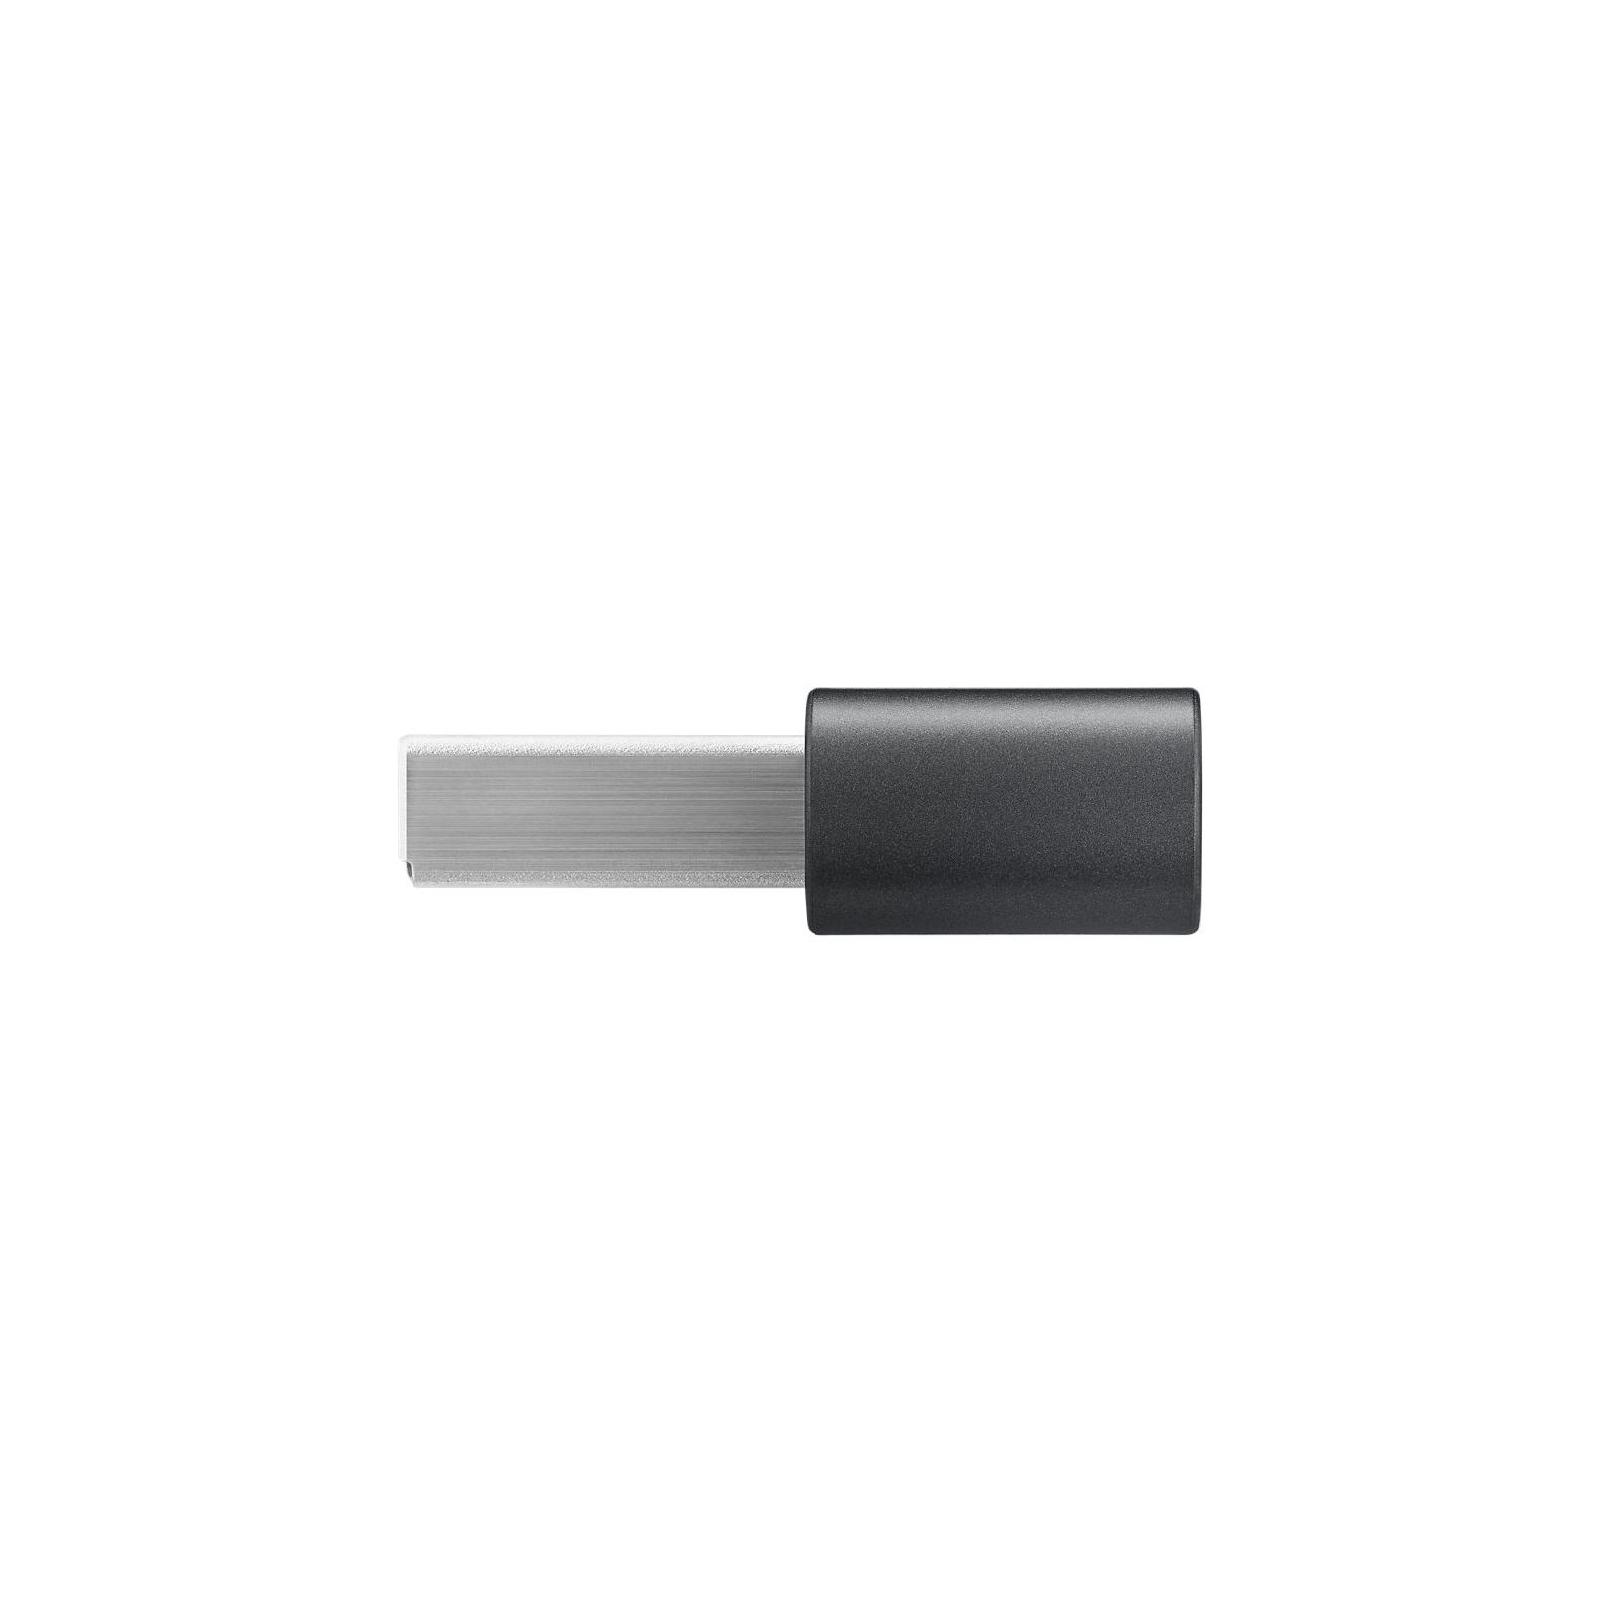 USB флеш накопитель Samsung 32GB Fit Plus USB 3.0 (MUF-32AB/APC) изображение 6